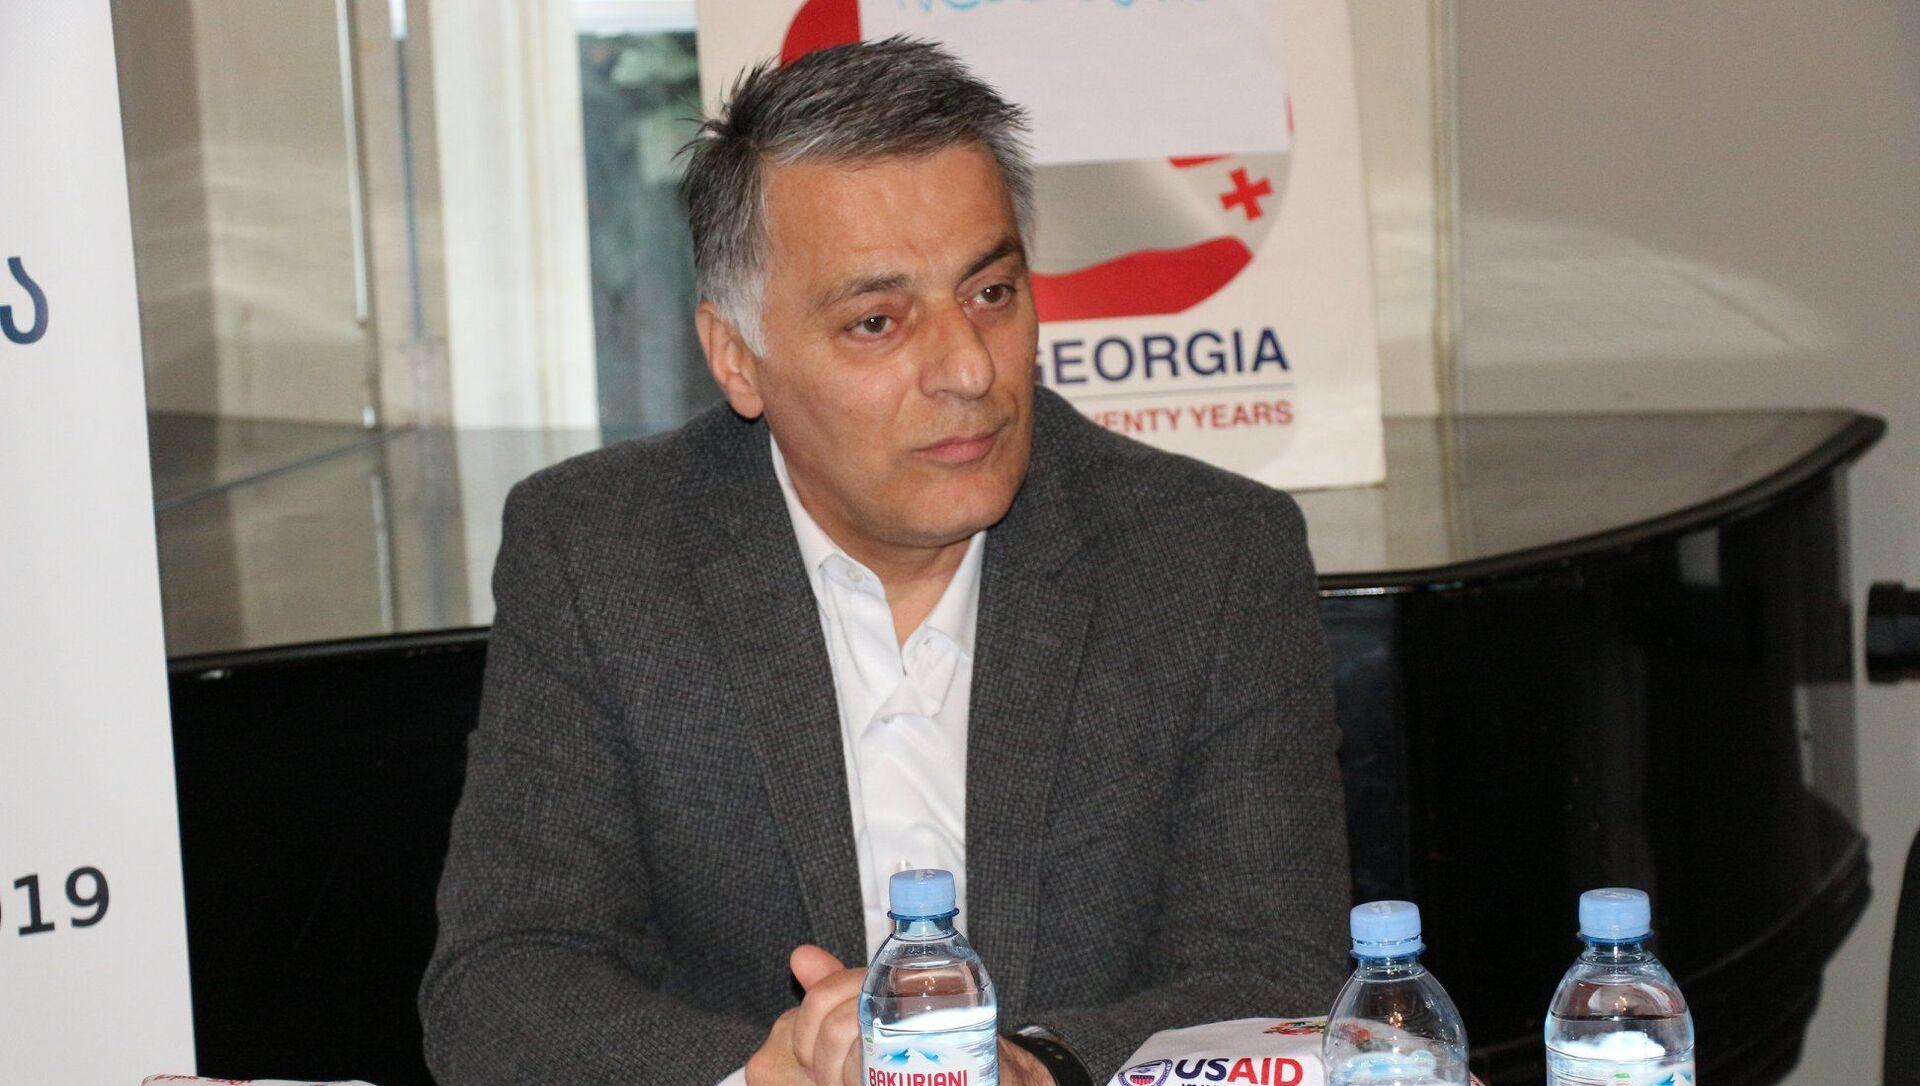 Депутат парламента Грузии Заал Микеладзе - Sputnik Грузия, 1920, 26.03.2021